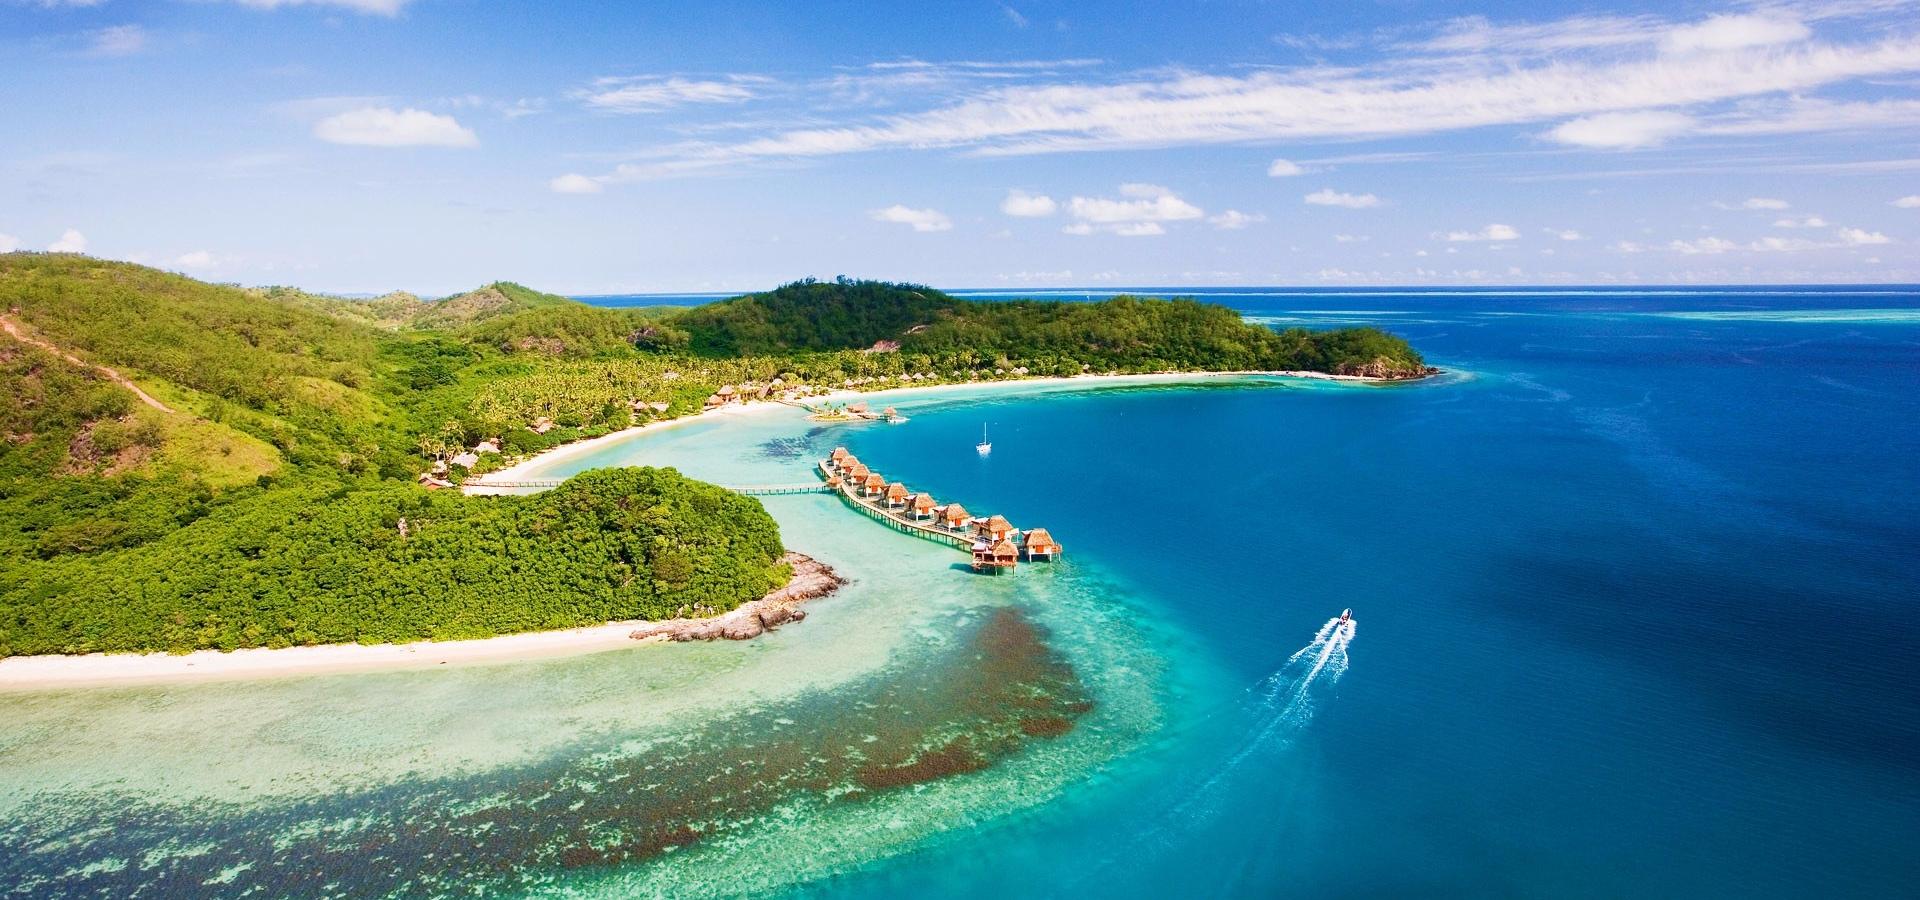 Fiji - Villas Likuliku Lagoon Resort